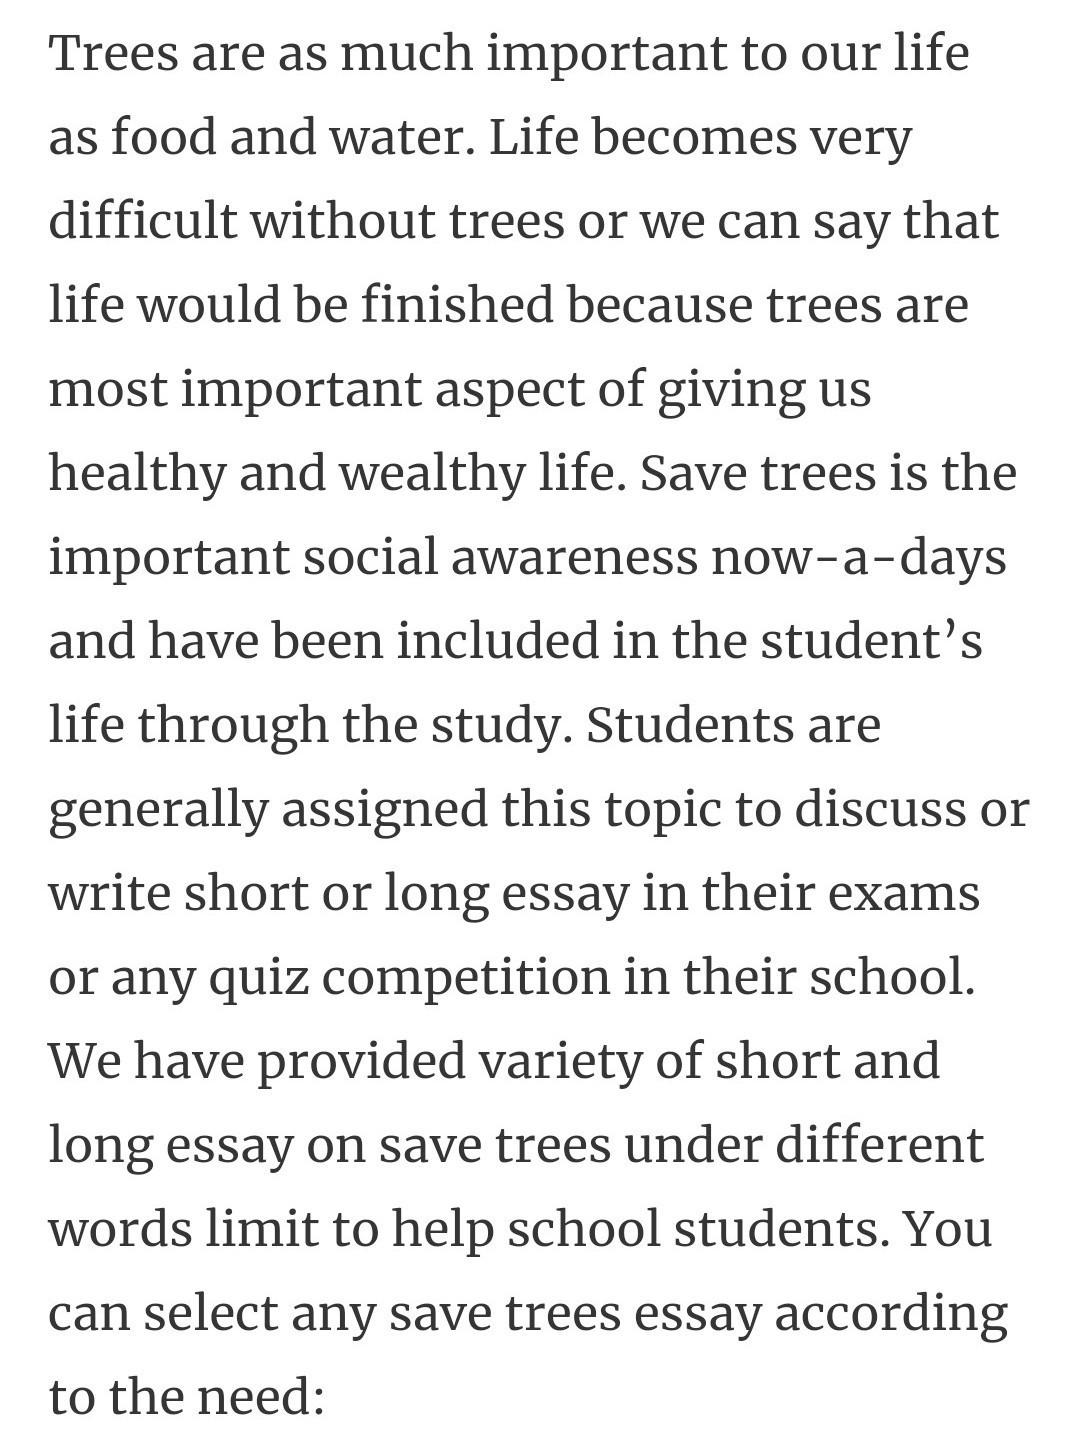 001 Essay Example Description Of Trees For Striking Essays Full